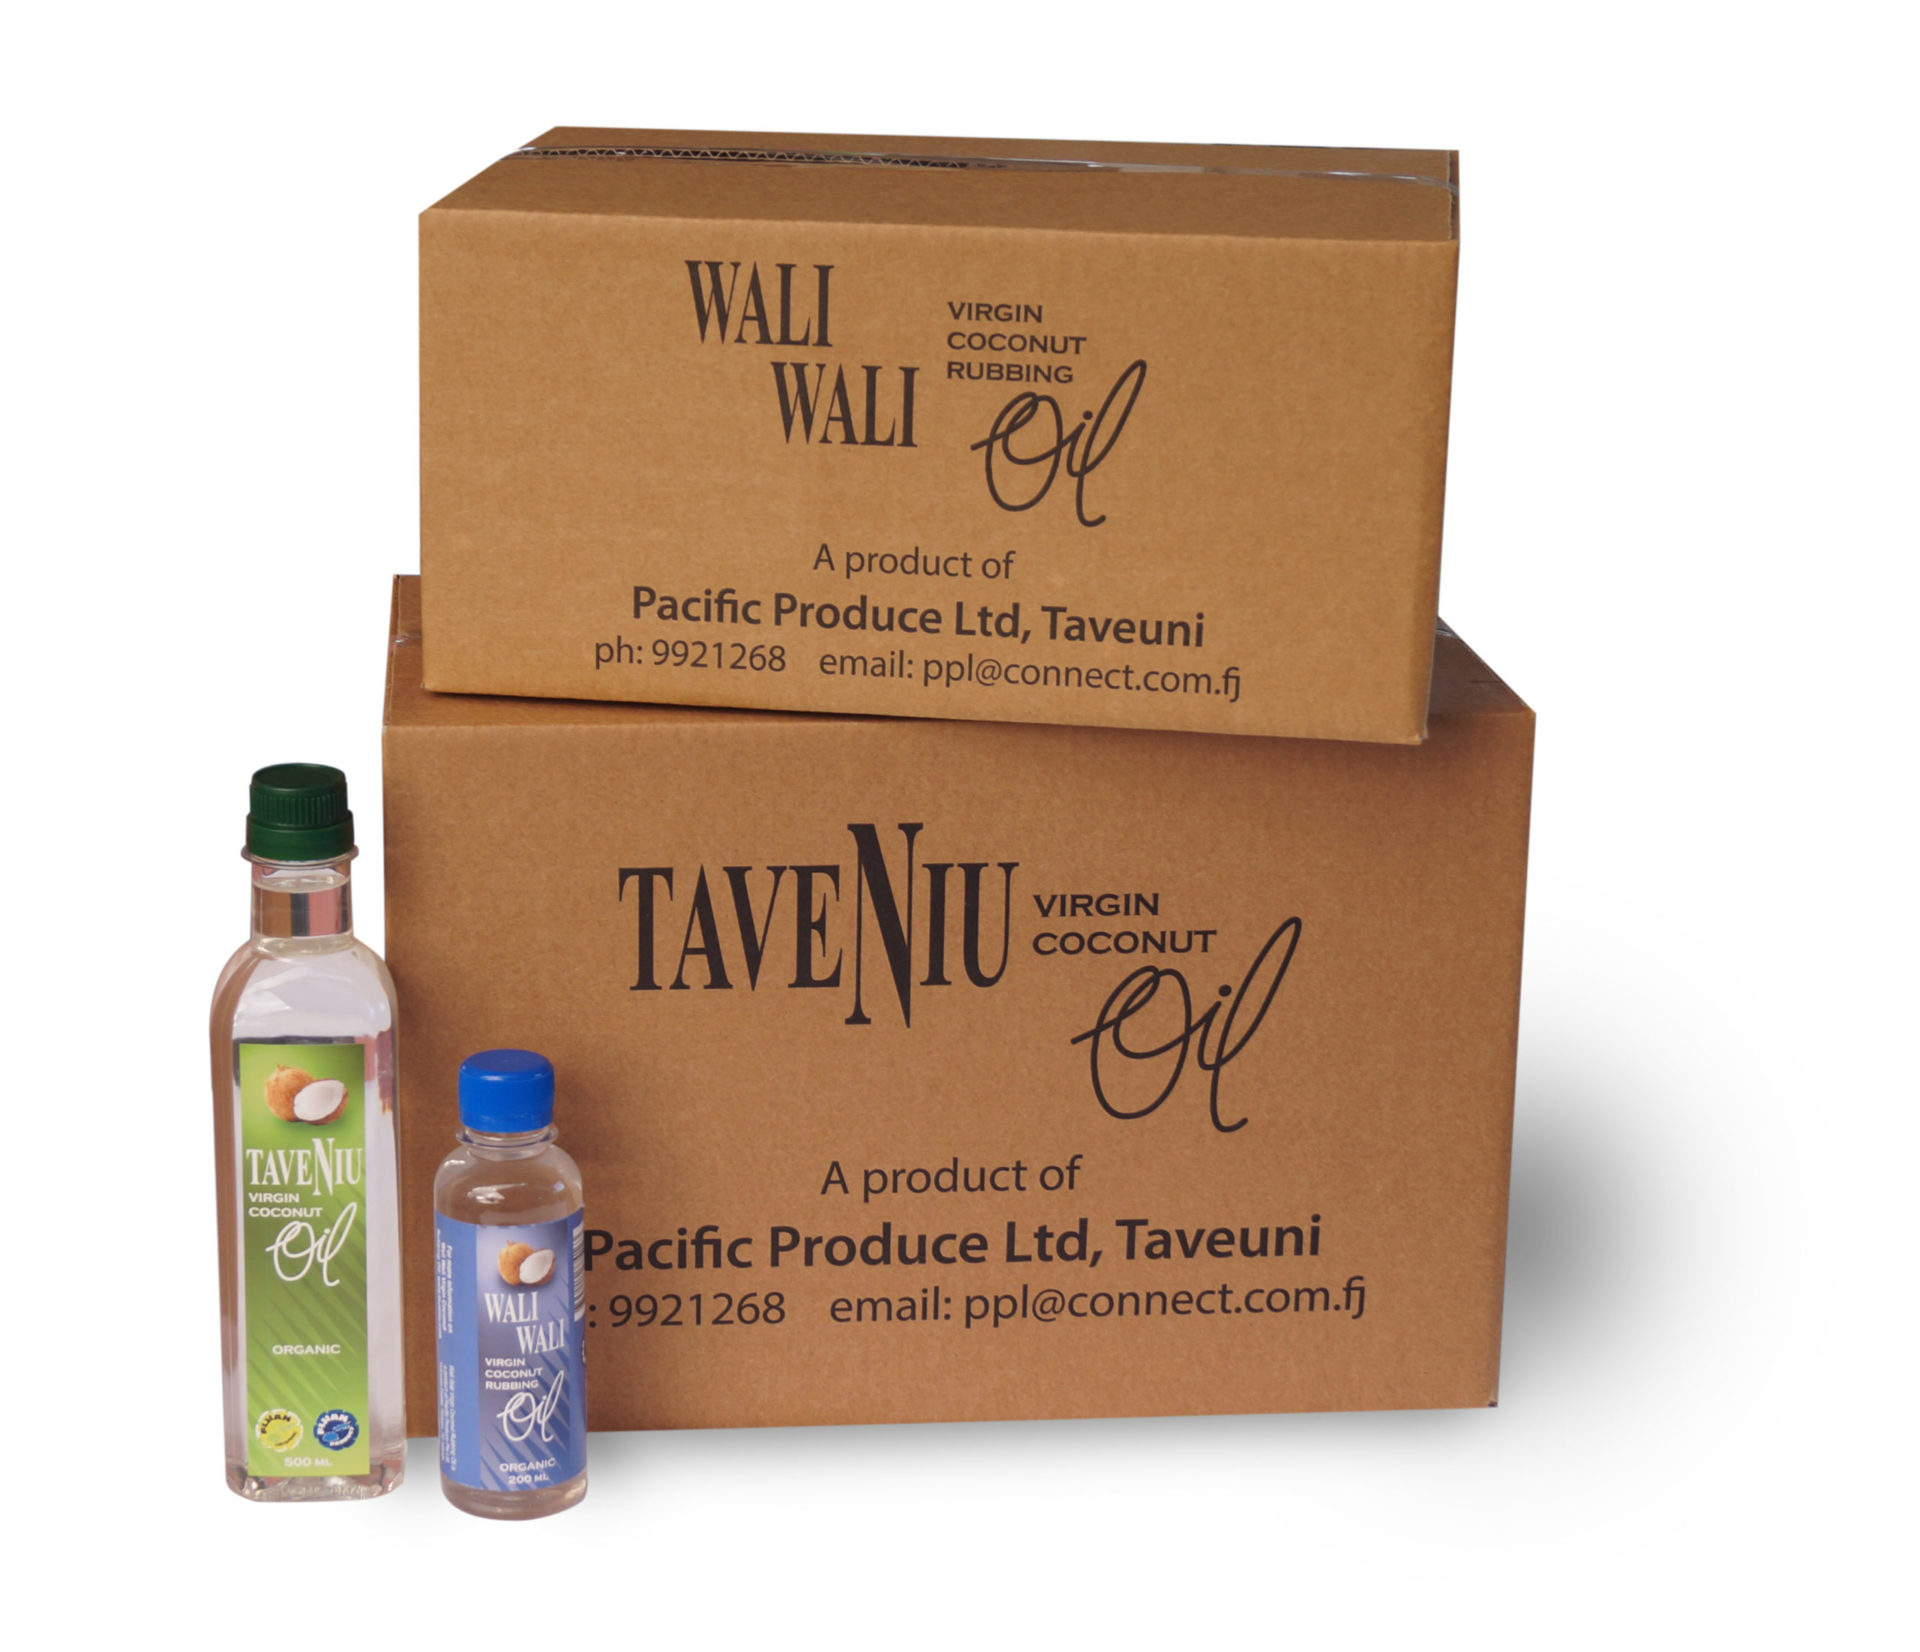 TaveNiu Virgin Coconut Oil Product Photos (2)